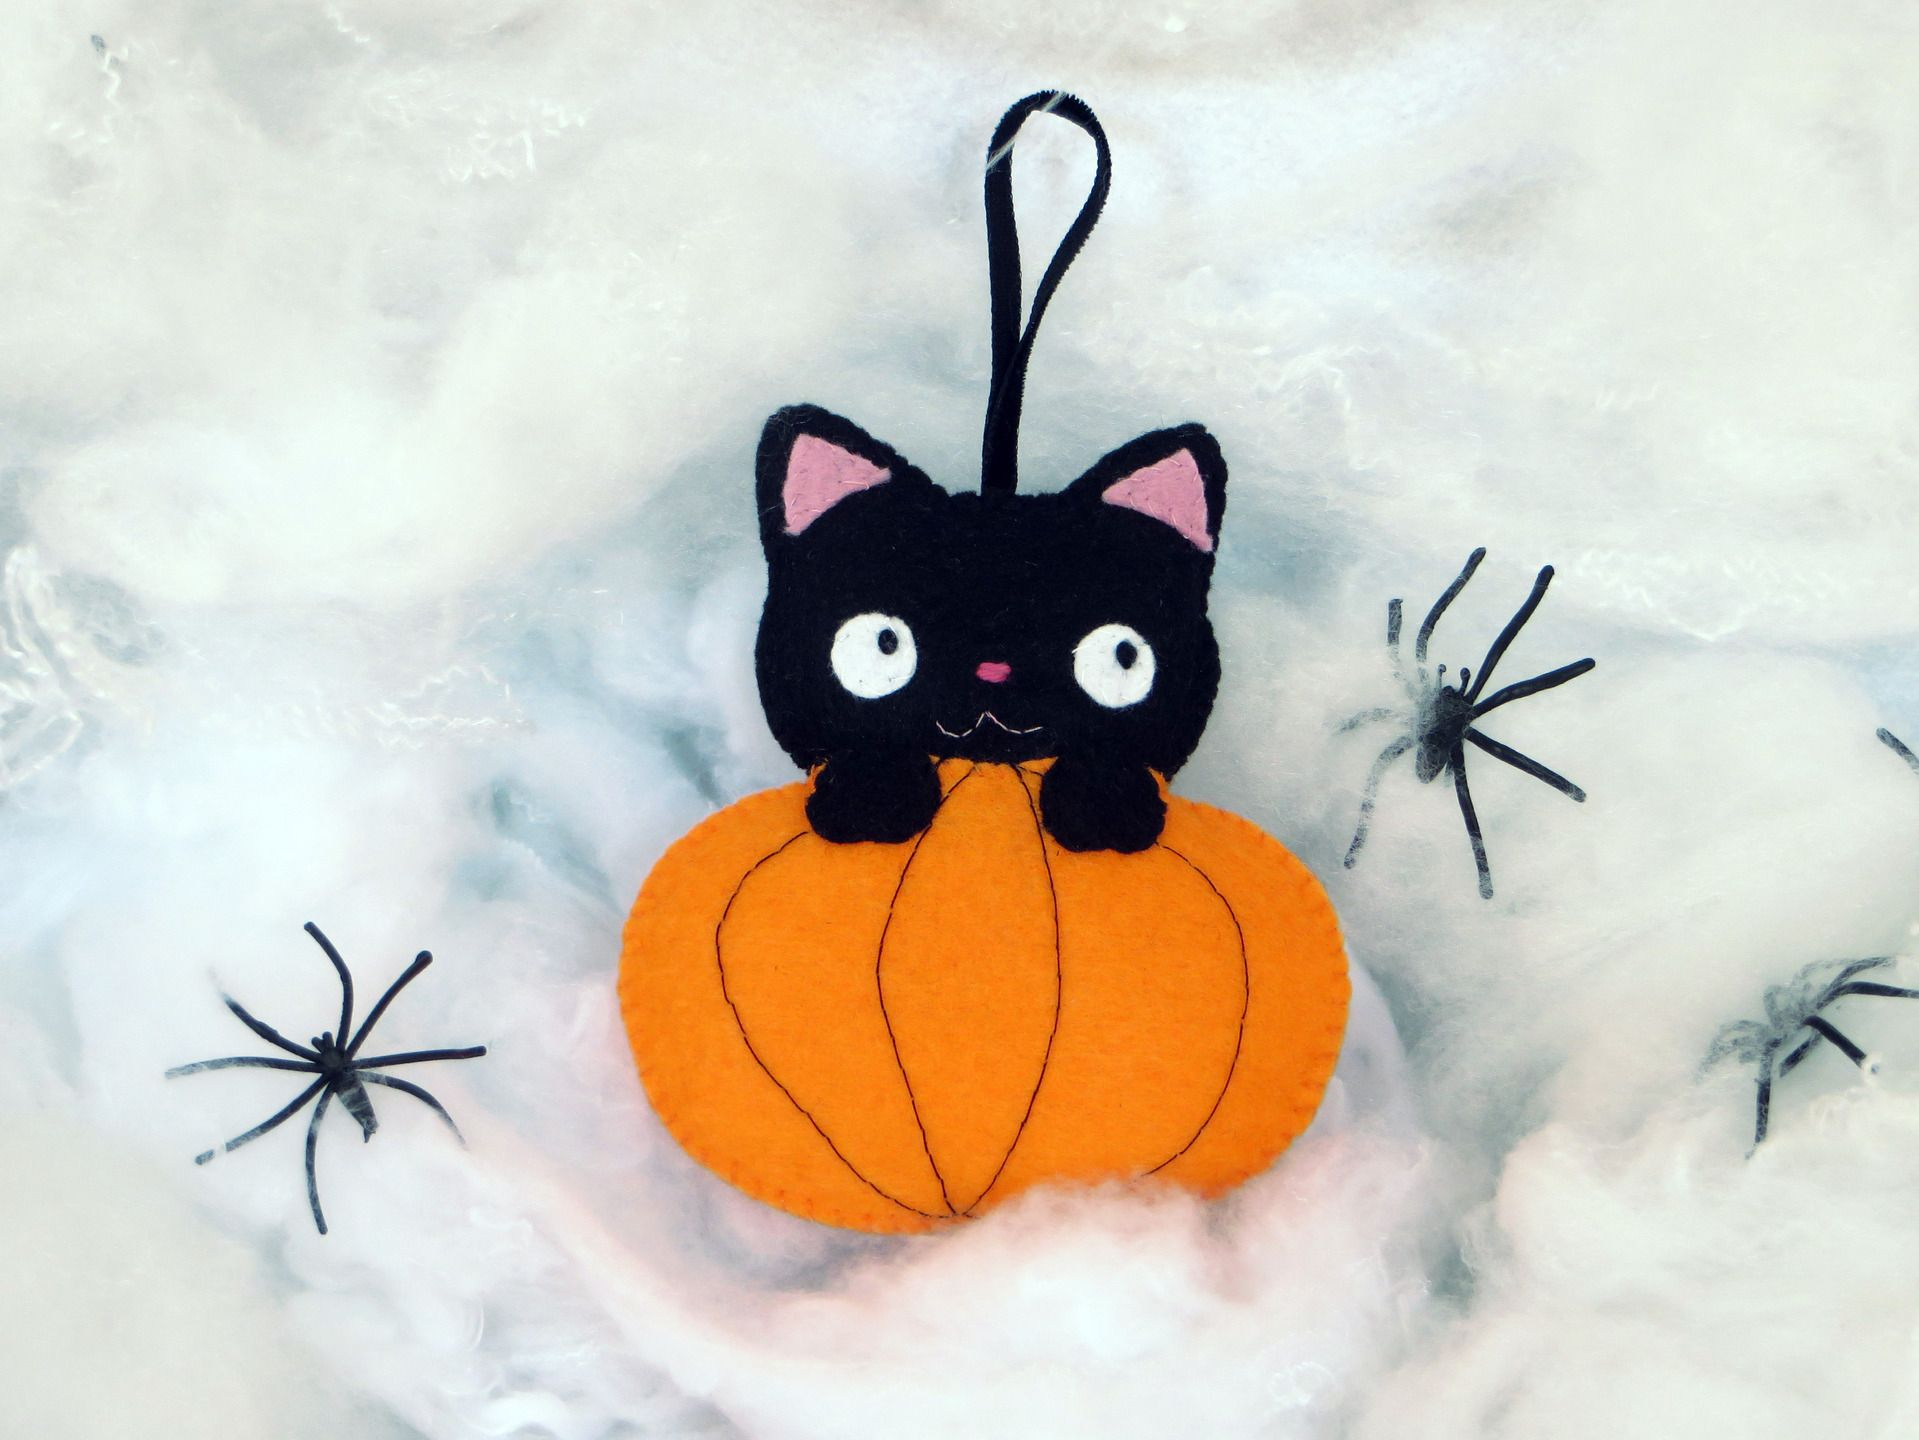 Halloween, chat noir, citrouille, chat kawaii, deco chat